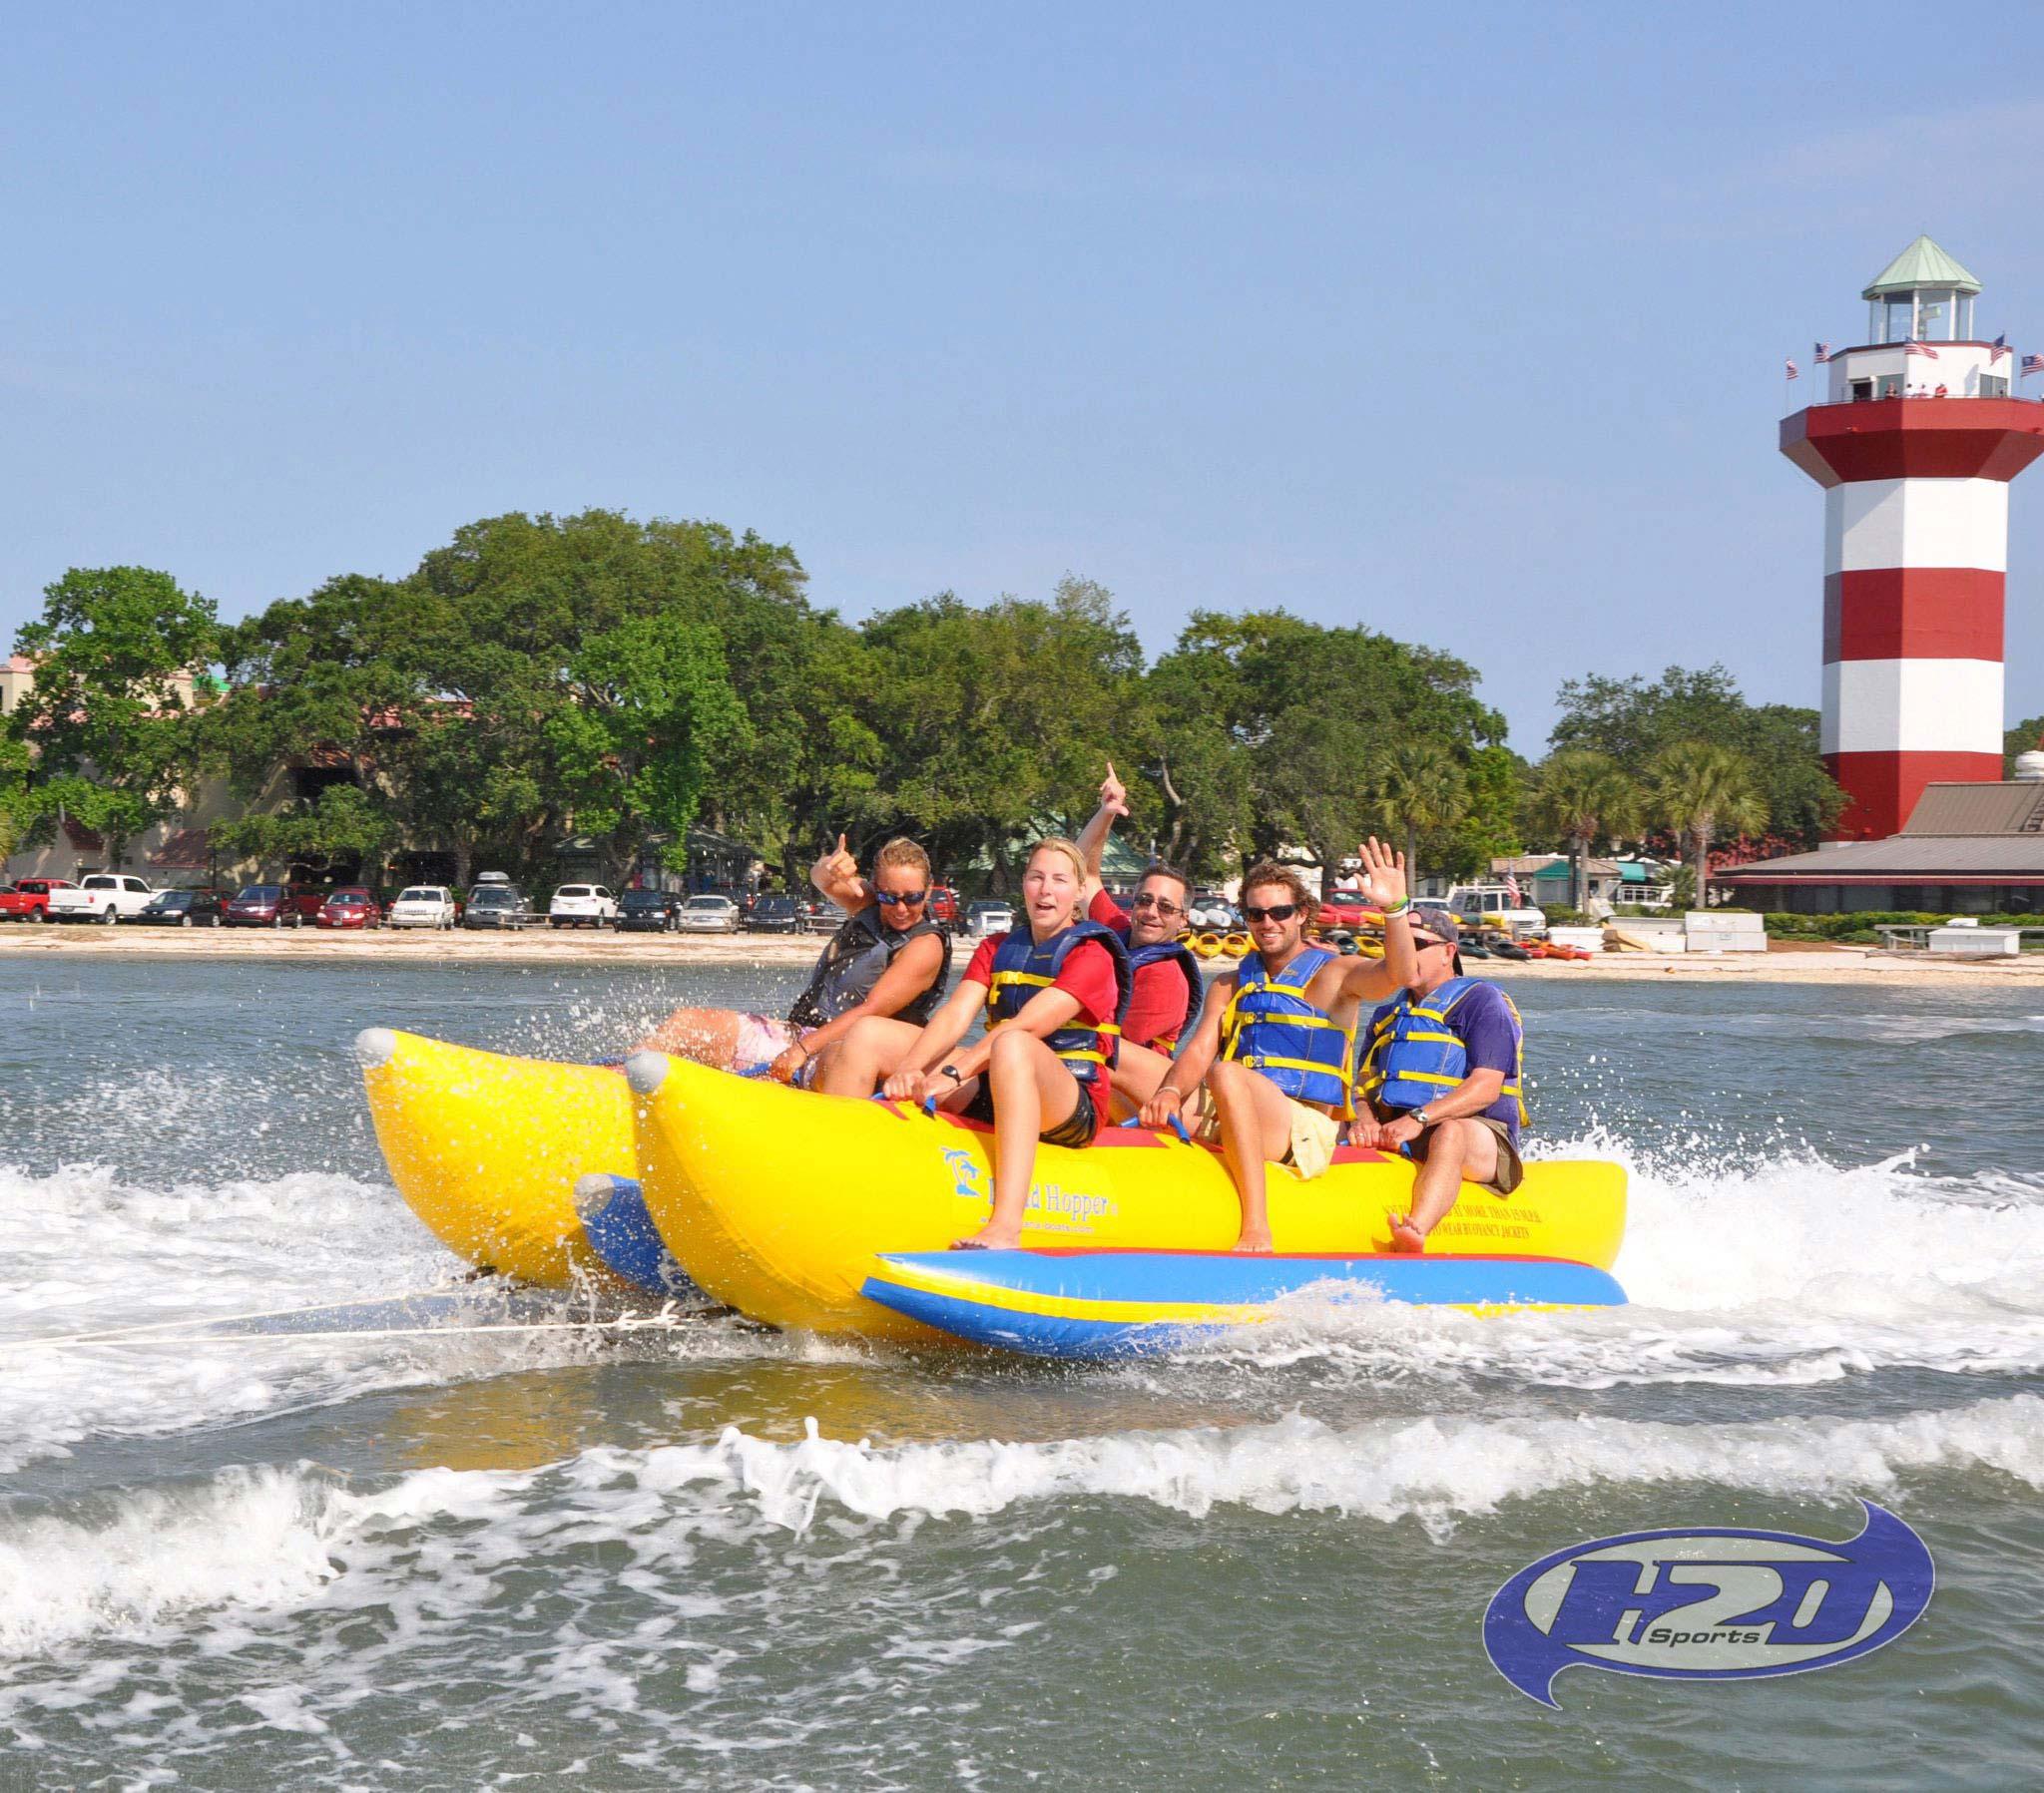 Pontoon Boat Rentals Hilton Head Island